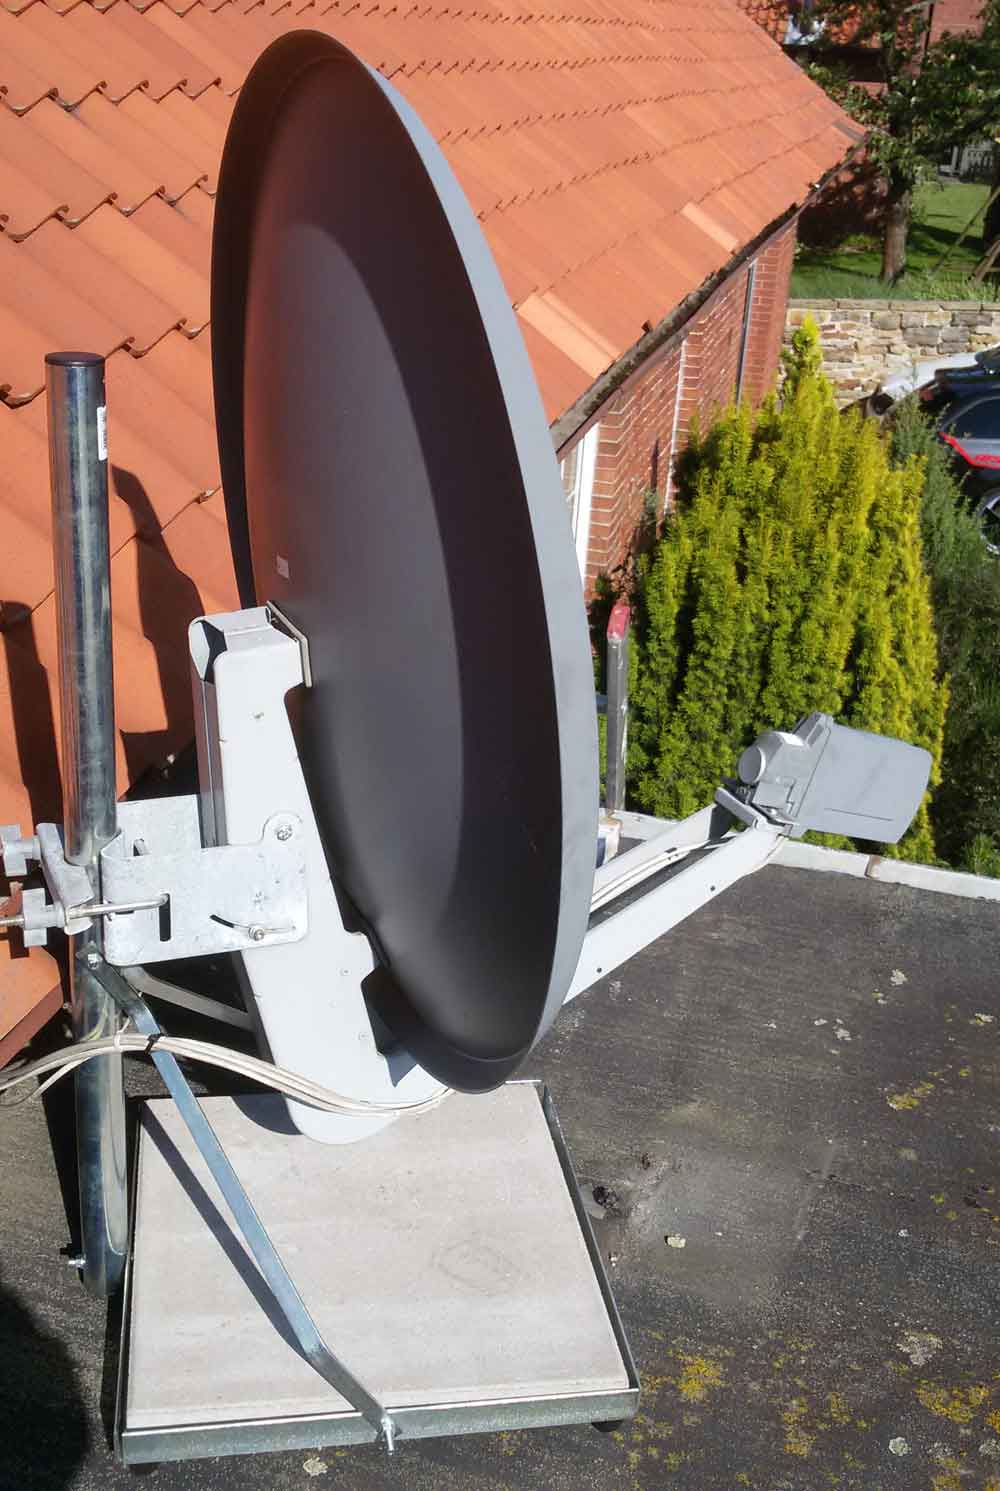 satelliten empfang technik stadthagen